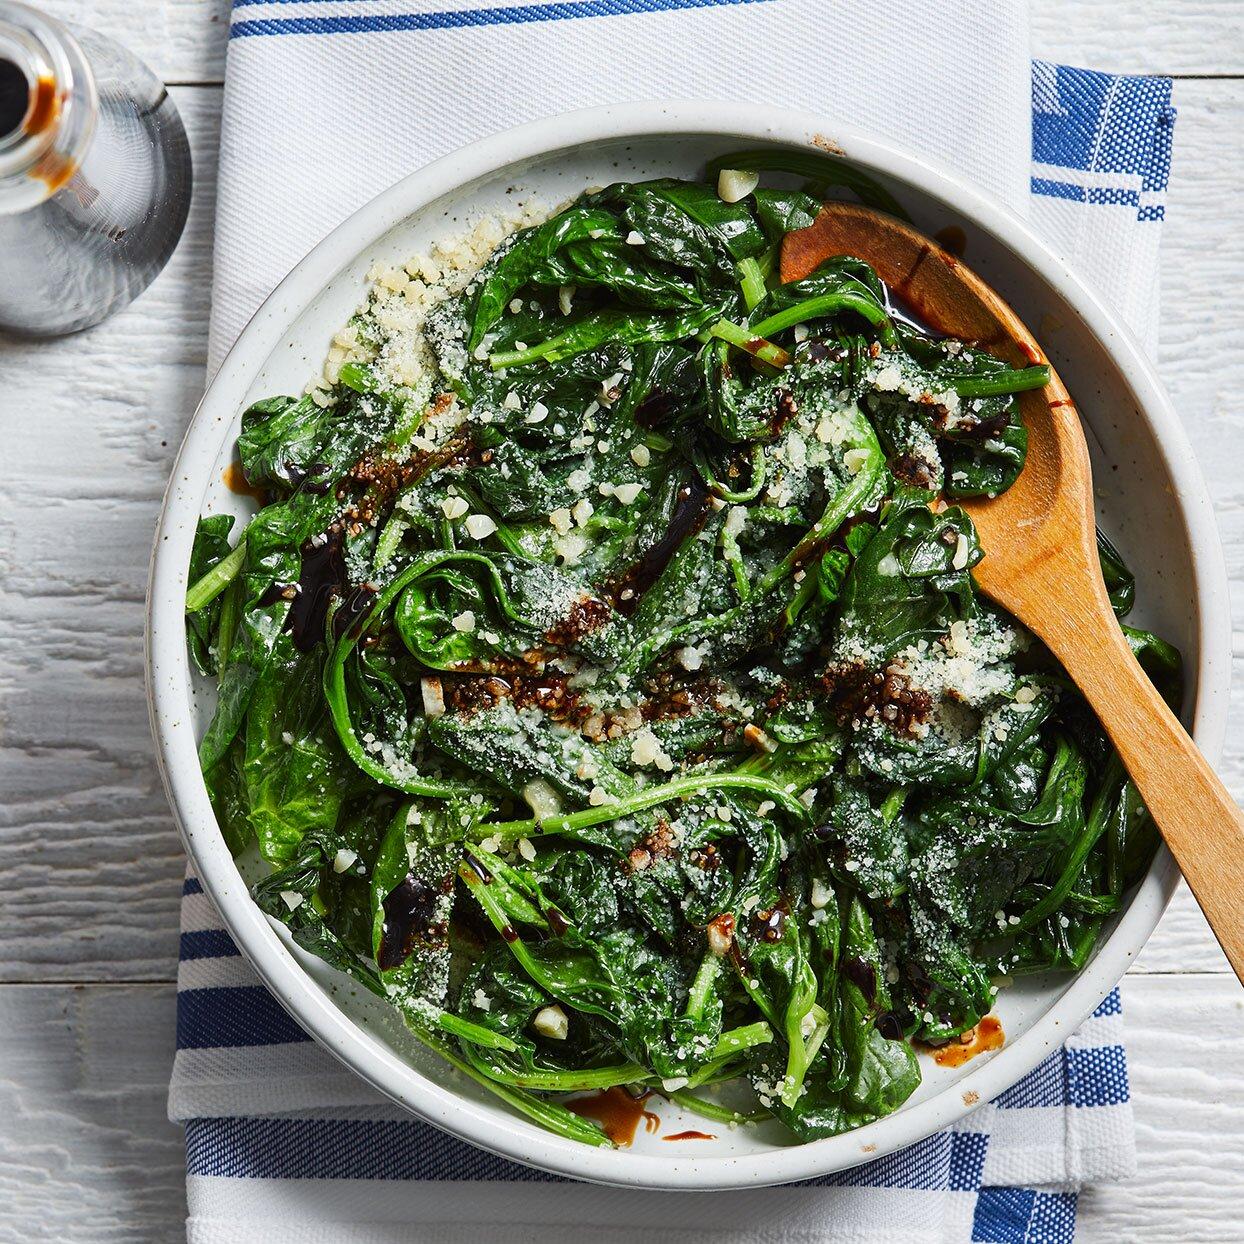 Balsamic-Parmesan Sauteed Spinach